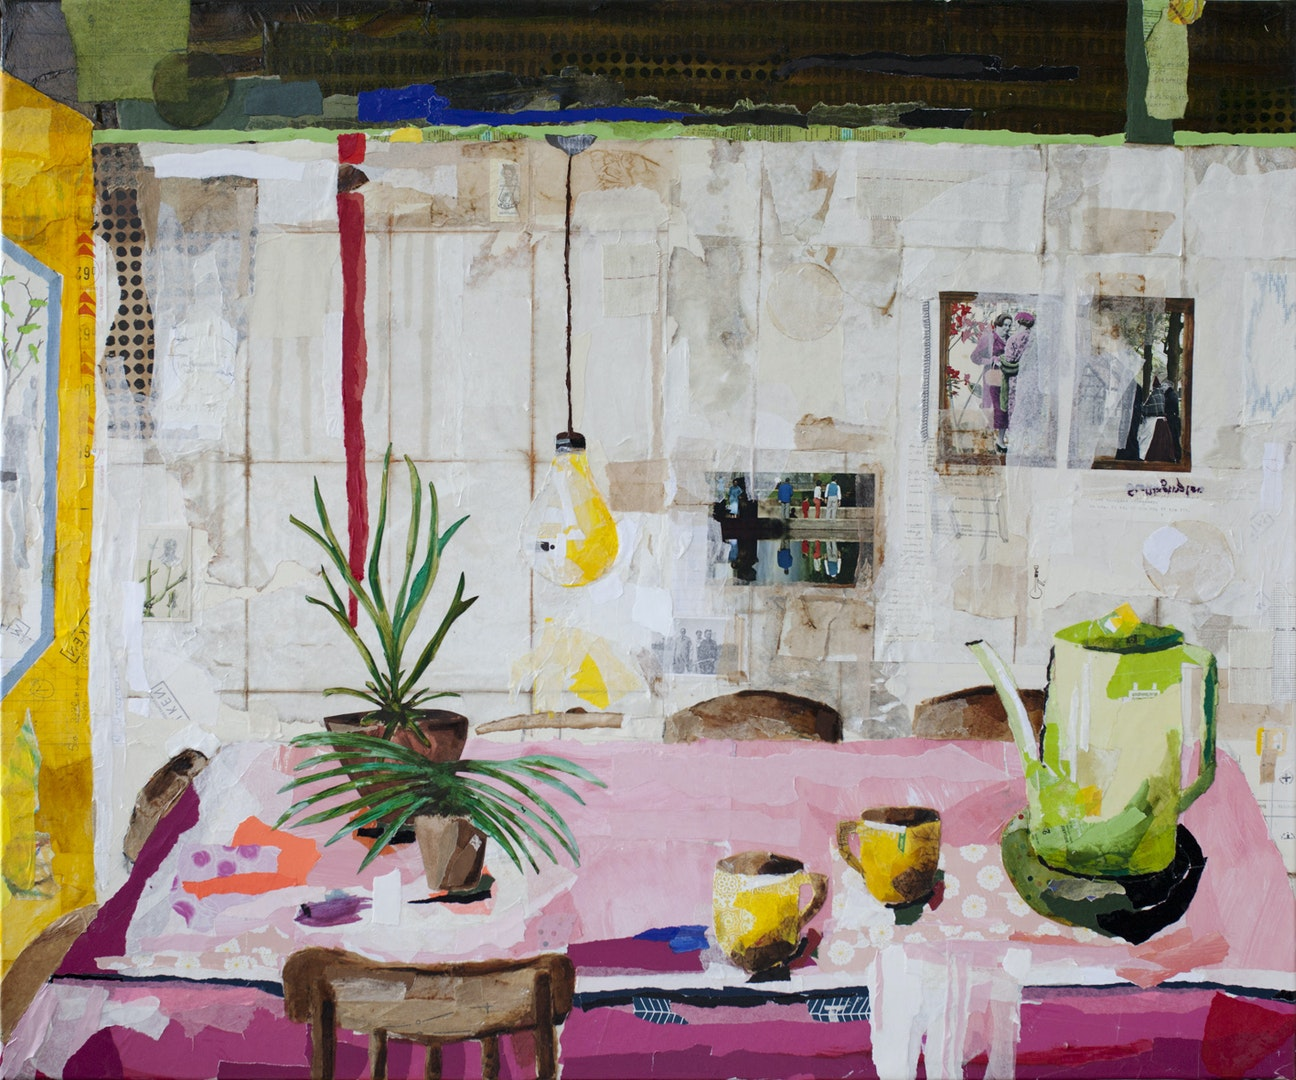 'Coffeebreak!', Astrid Vlasman, Paper and oil on canvas, 100 cm x 120 cm